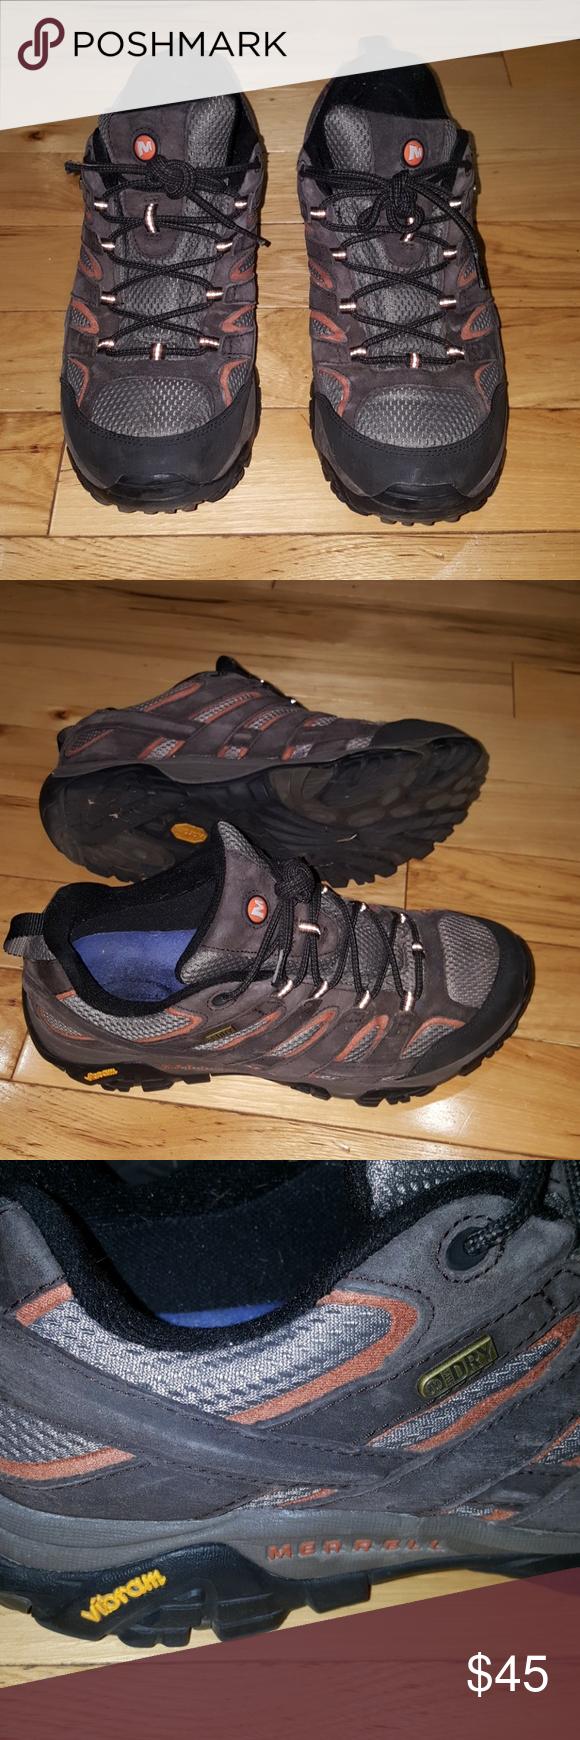 world-wide free shipping favorable price choose latest Merrell men's shoes size 11 Merrell dry Merrell Vibram men's ...